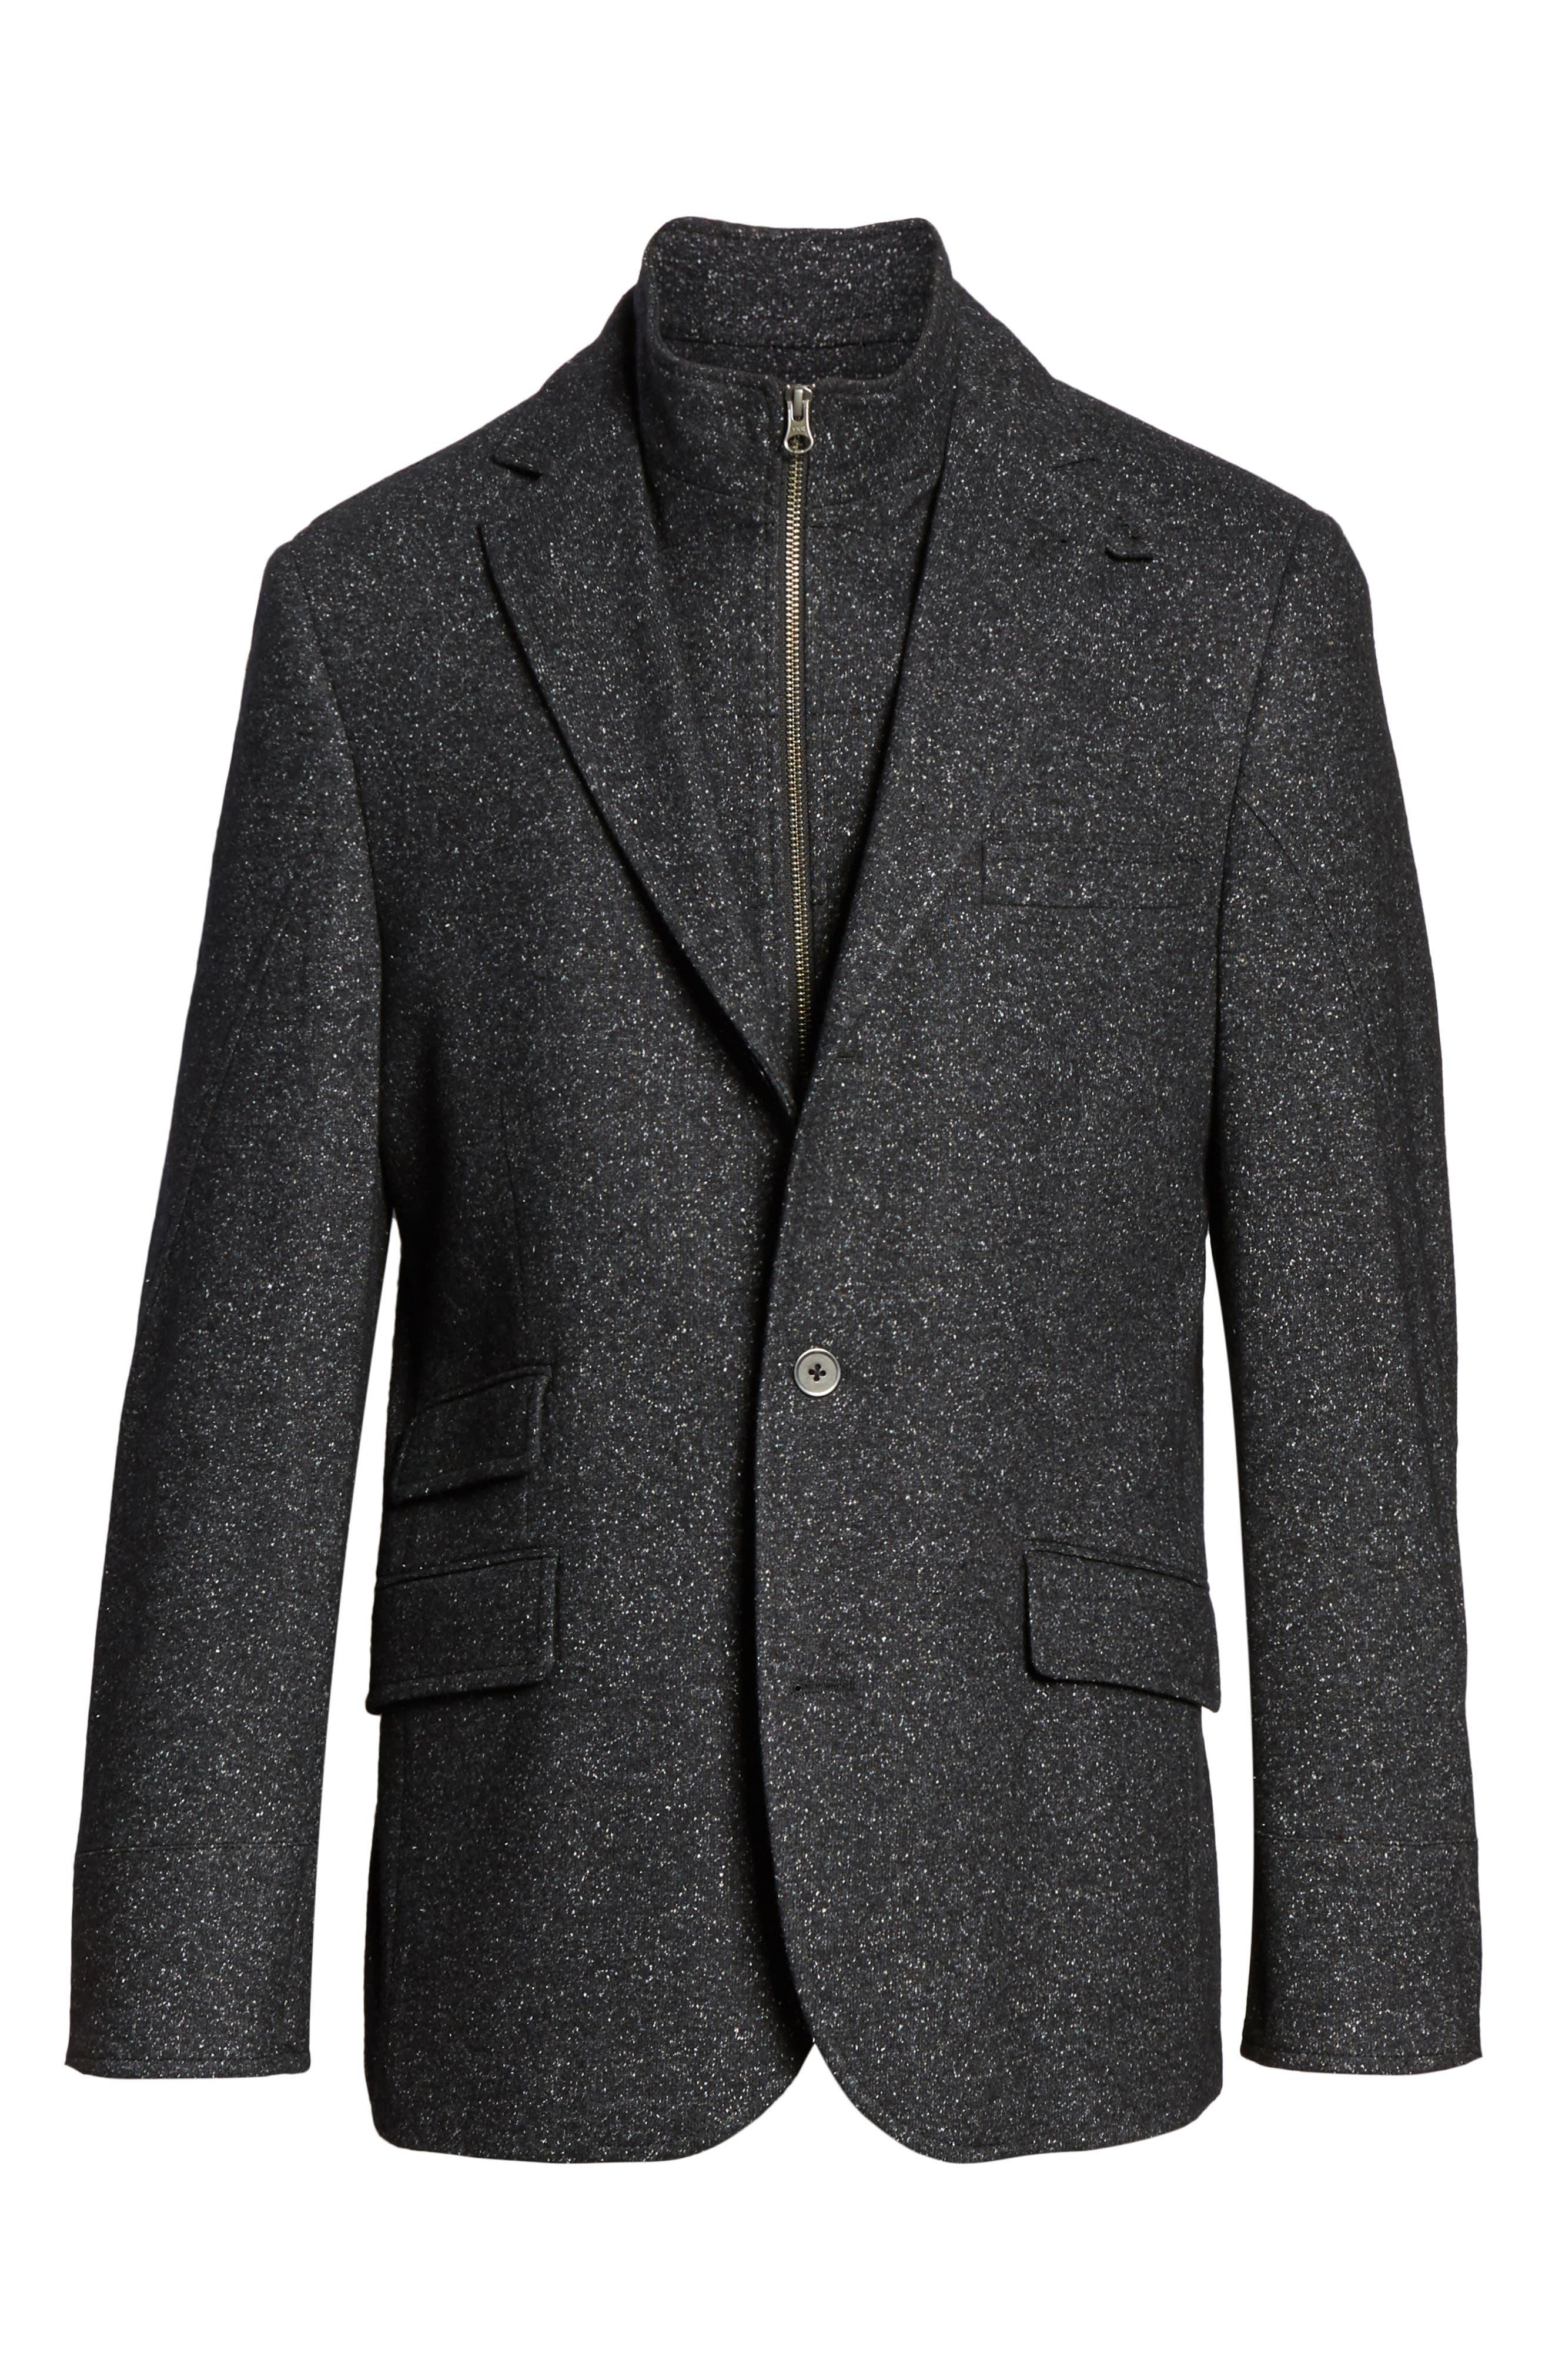 Donegal Wool Blend Hybrid Coat,                             Alternate thumbnail 6, color,                             Charcoal